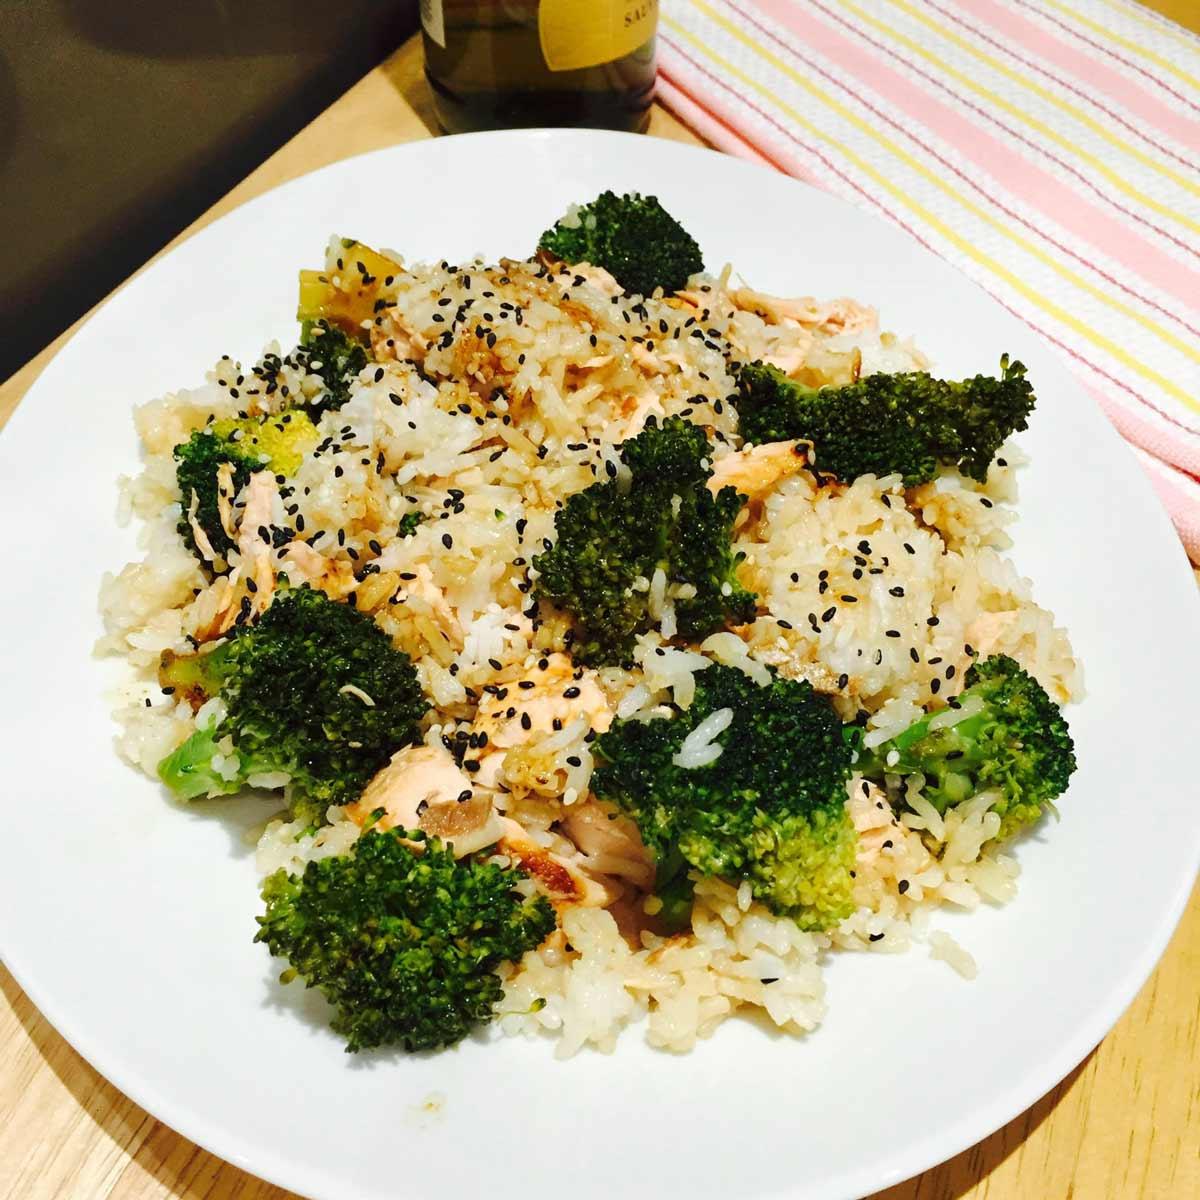 A mess of salmon, rice and broccoli